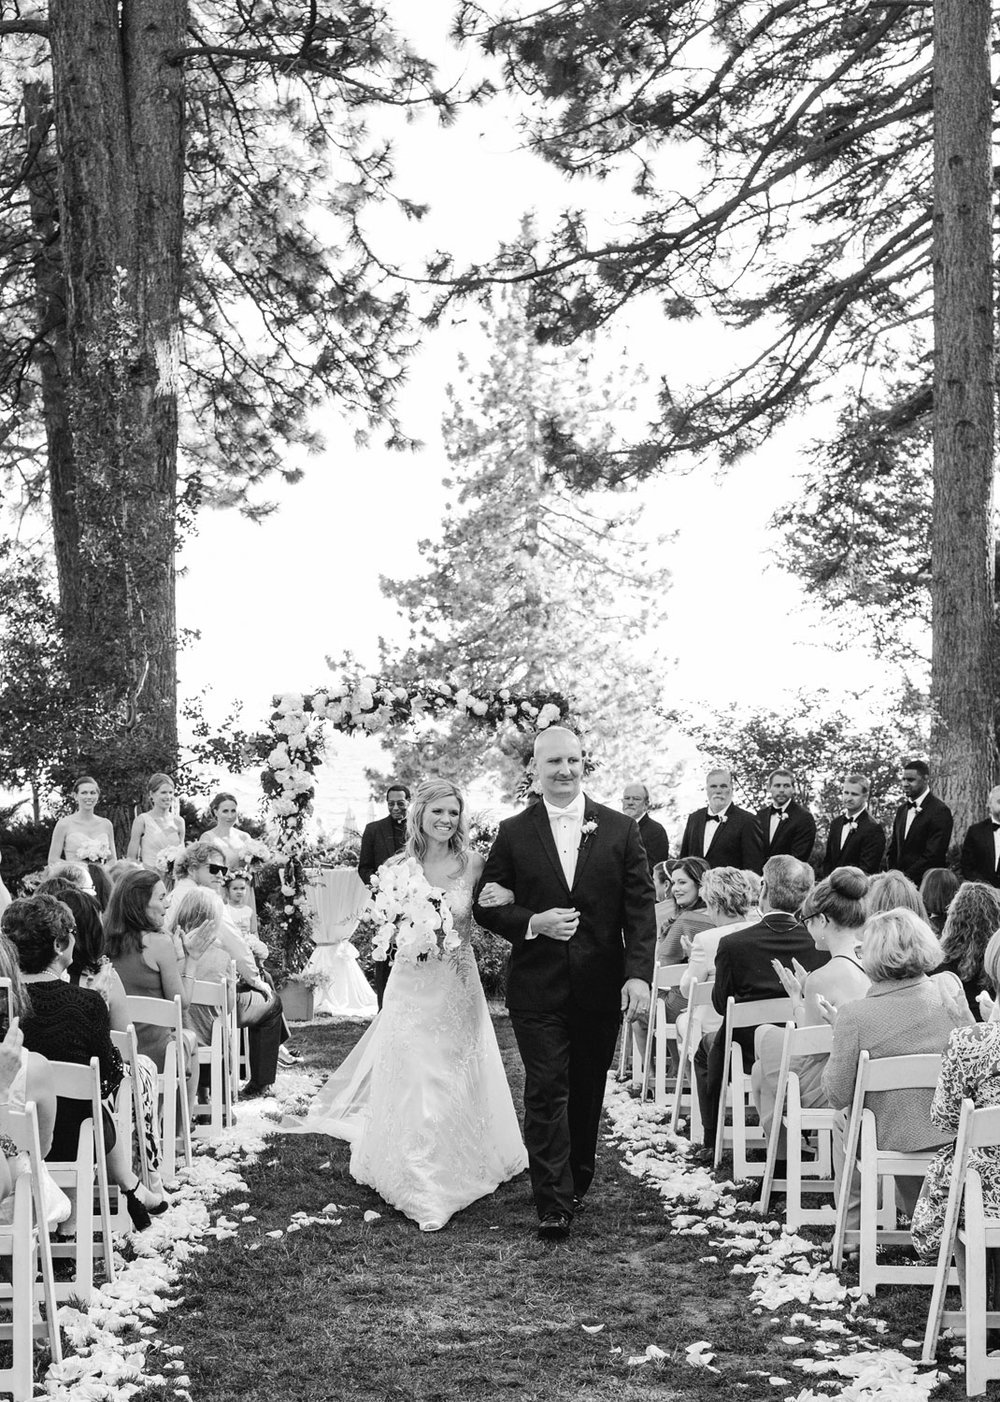 Lake_Tahoe_Hyatt_Wedding_Photographer_019.JPG